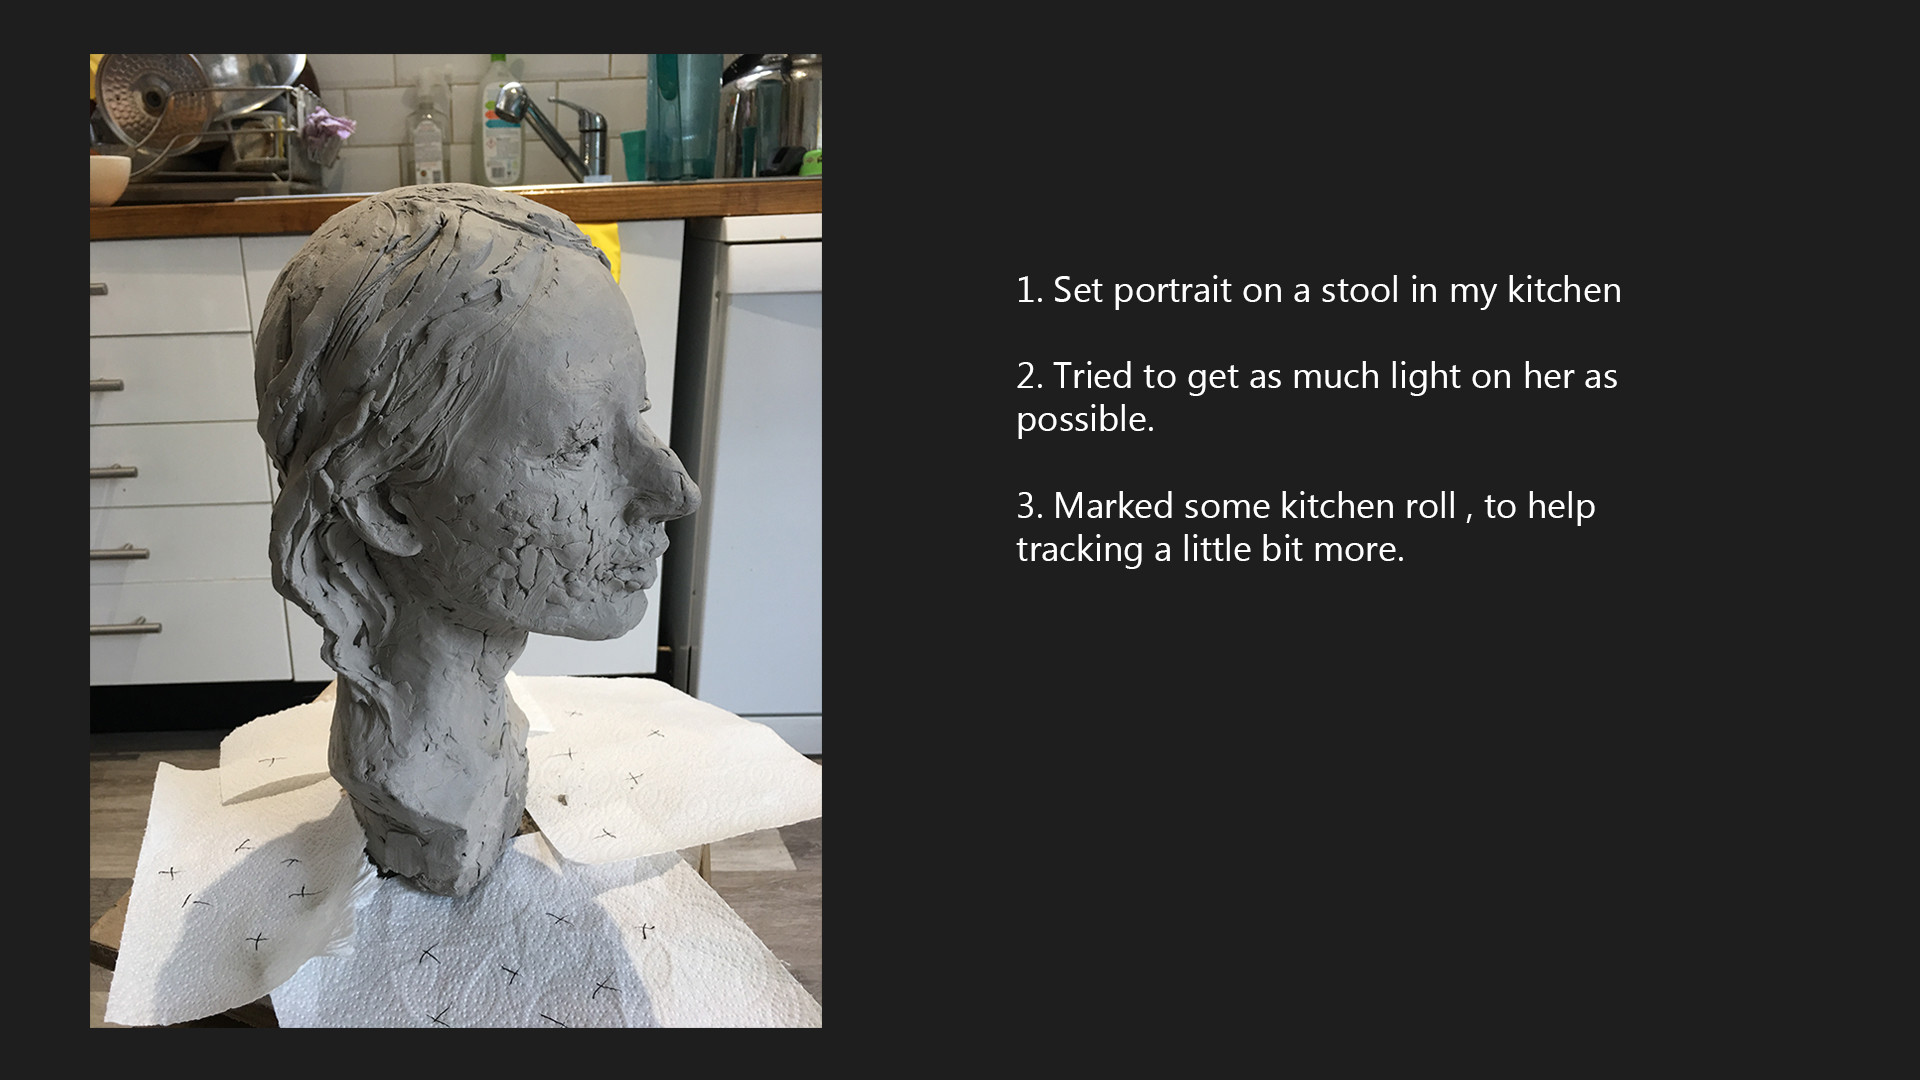 Christopher antoniou hiromisculpture03